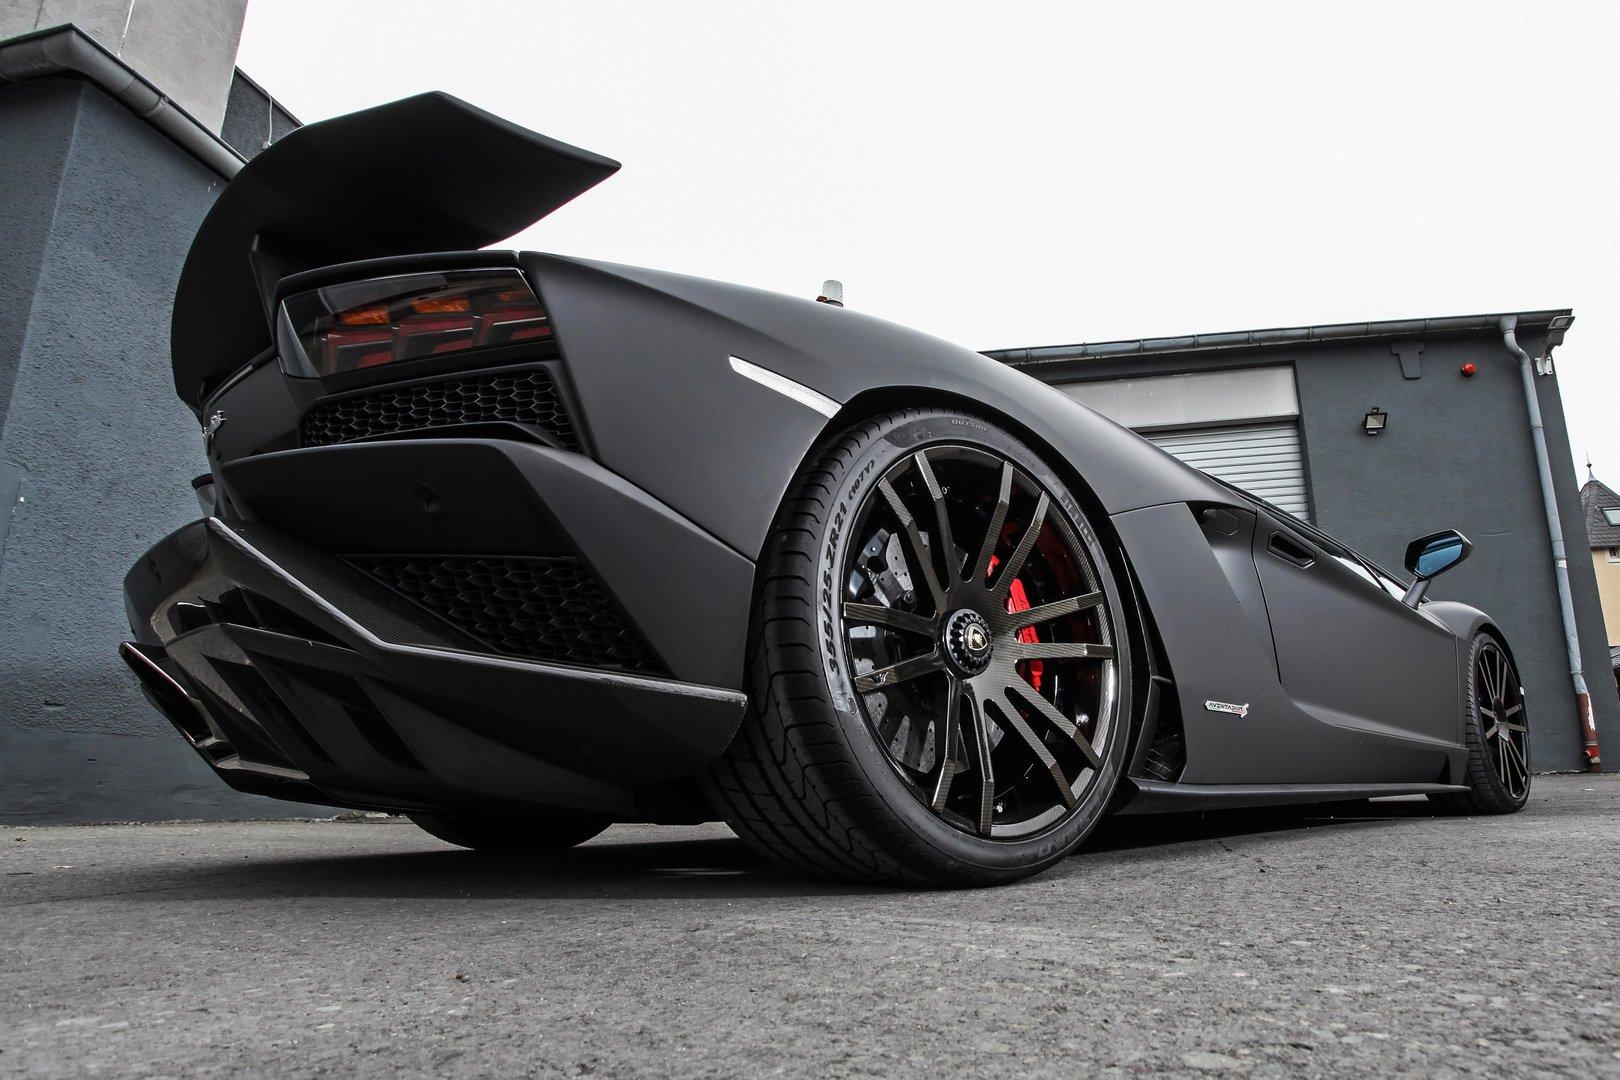 Lamborghini Aventador S Roadster by Wheelsandmore (2)